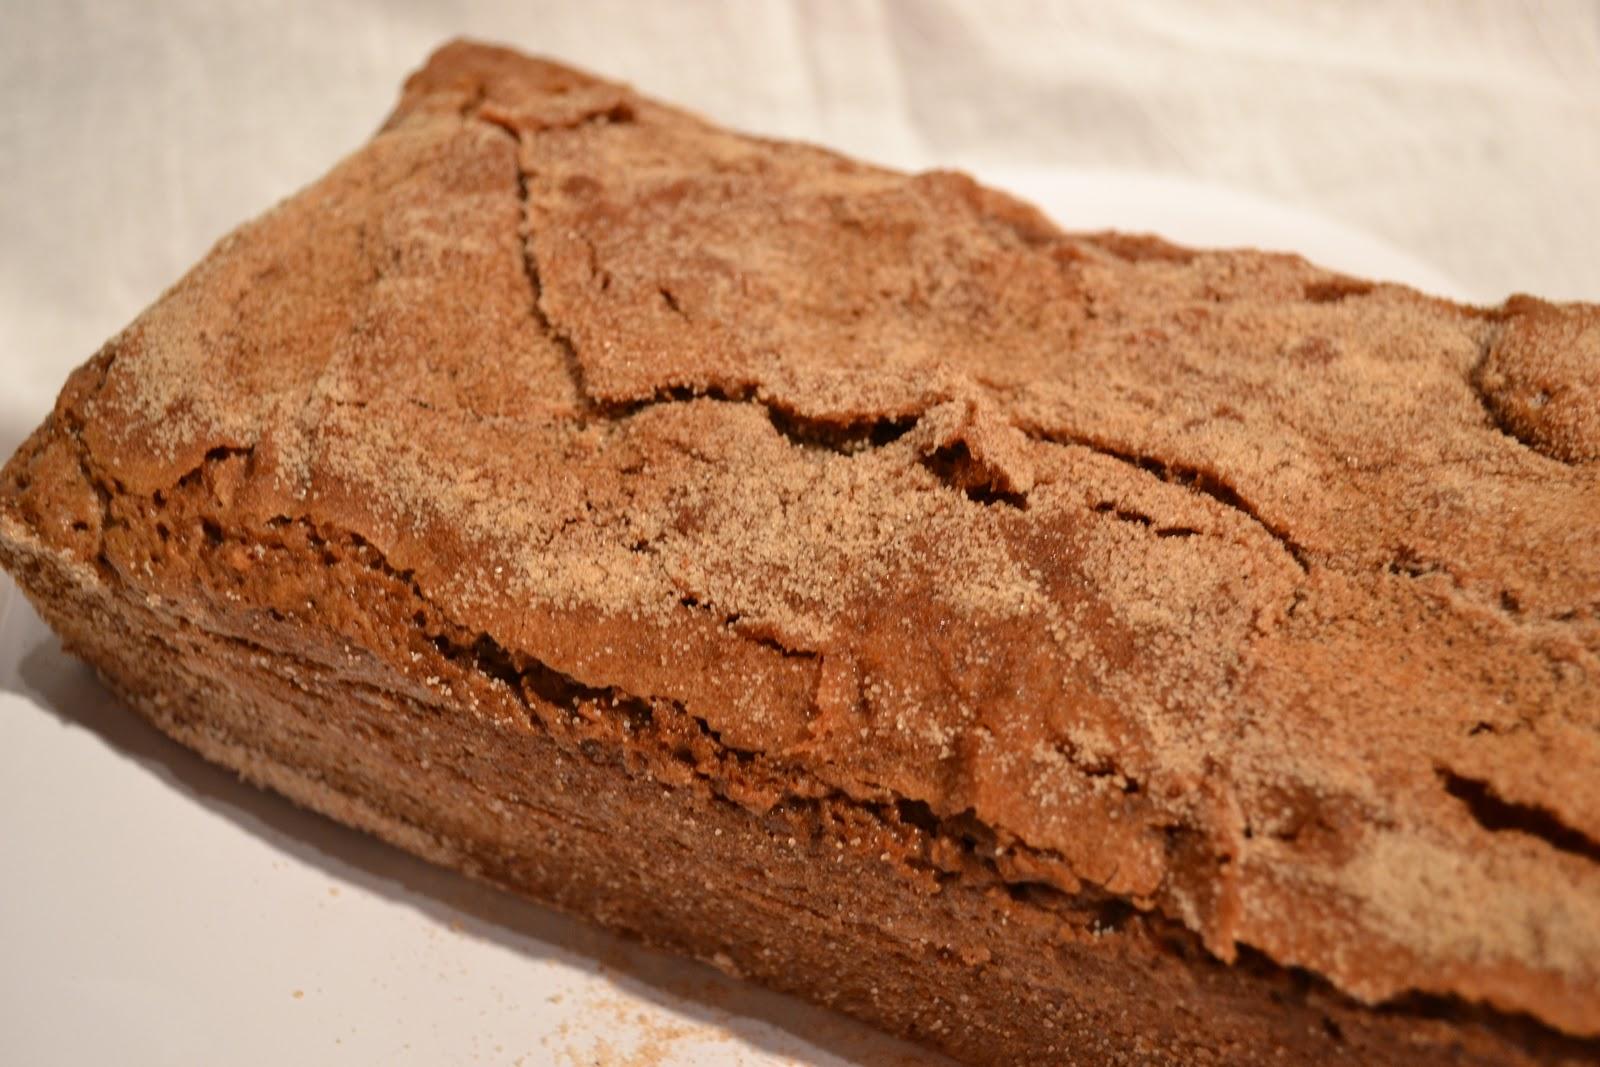 ... bread was this amish friendship bread a wonderful cake like bread you